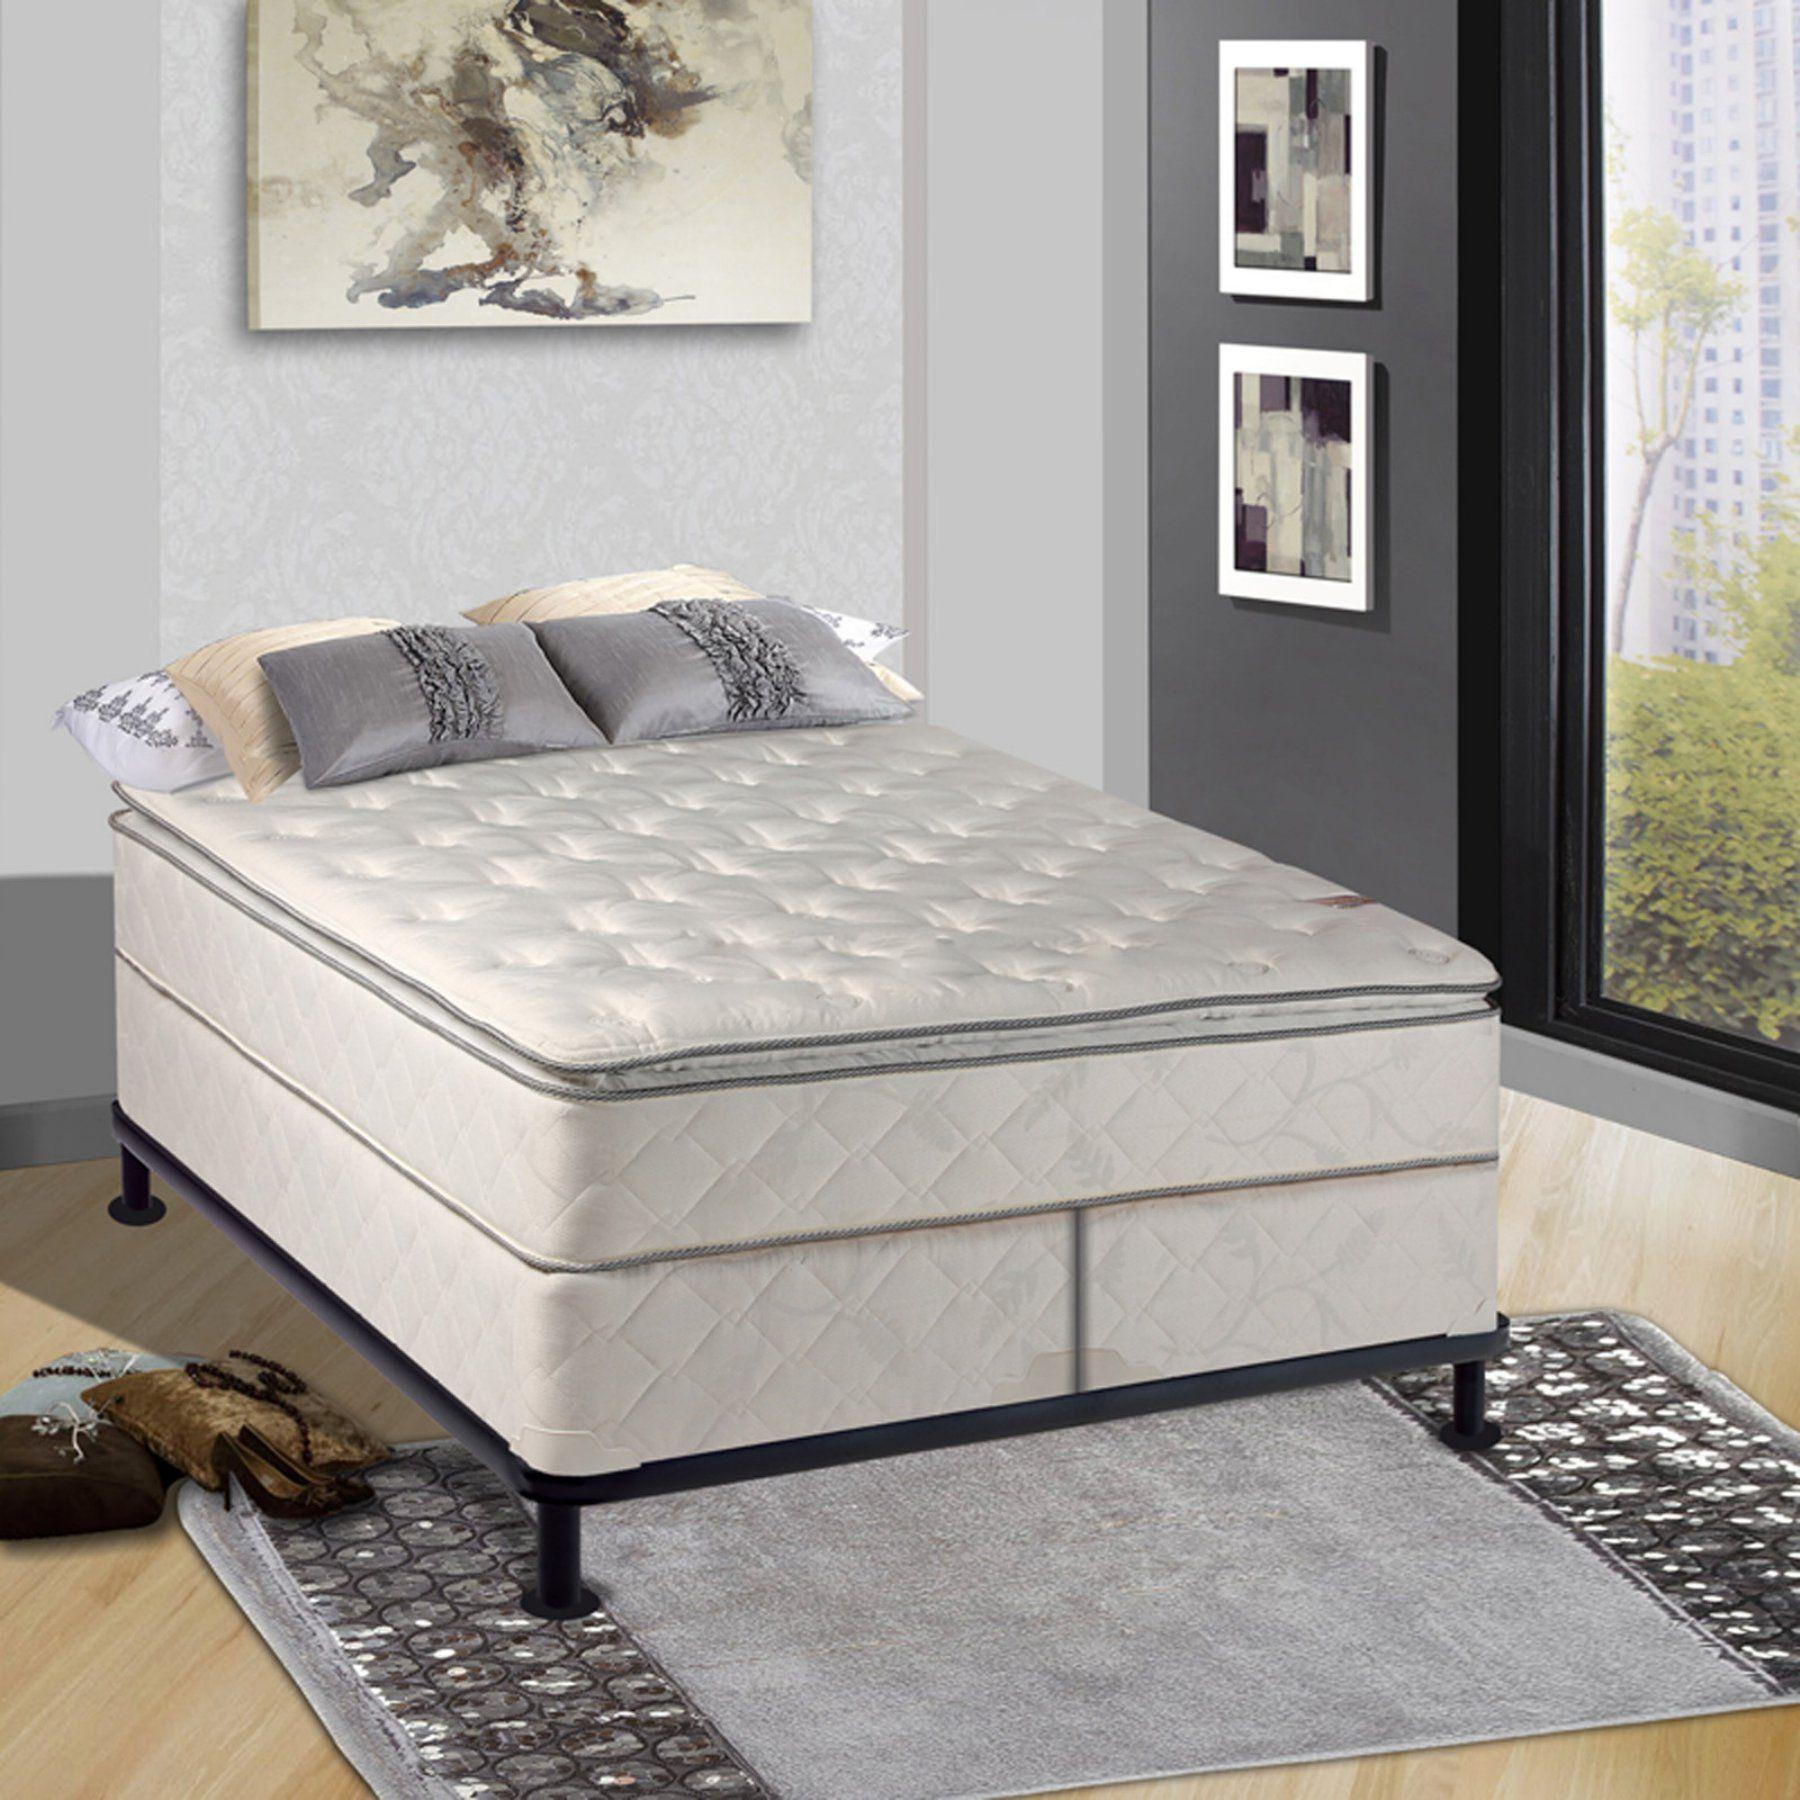 Continental Sleep Medium Plush 11 in. Pillowtop Orthopedic